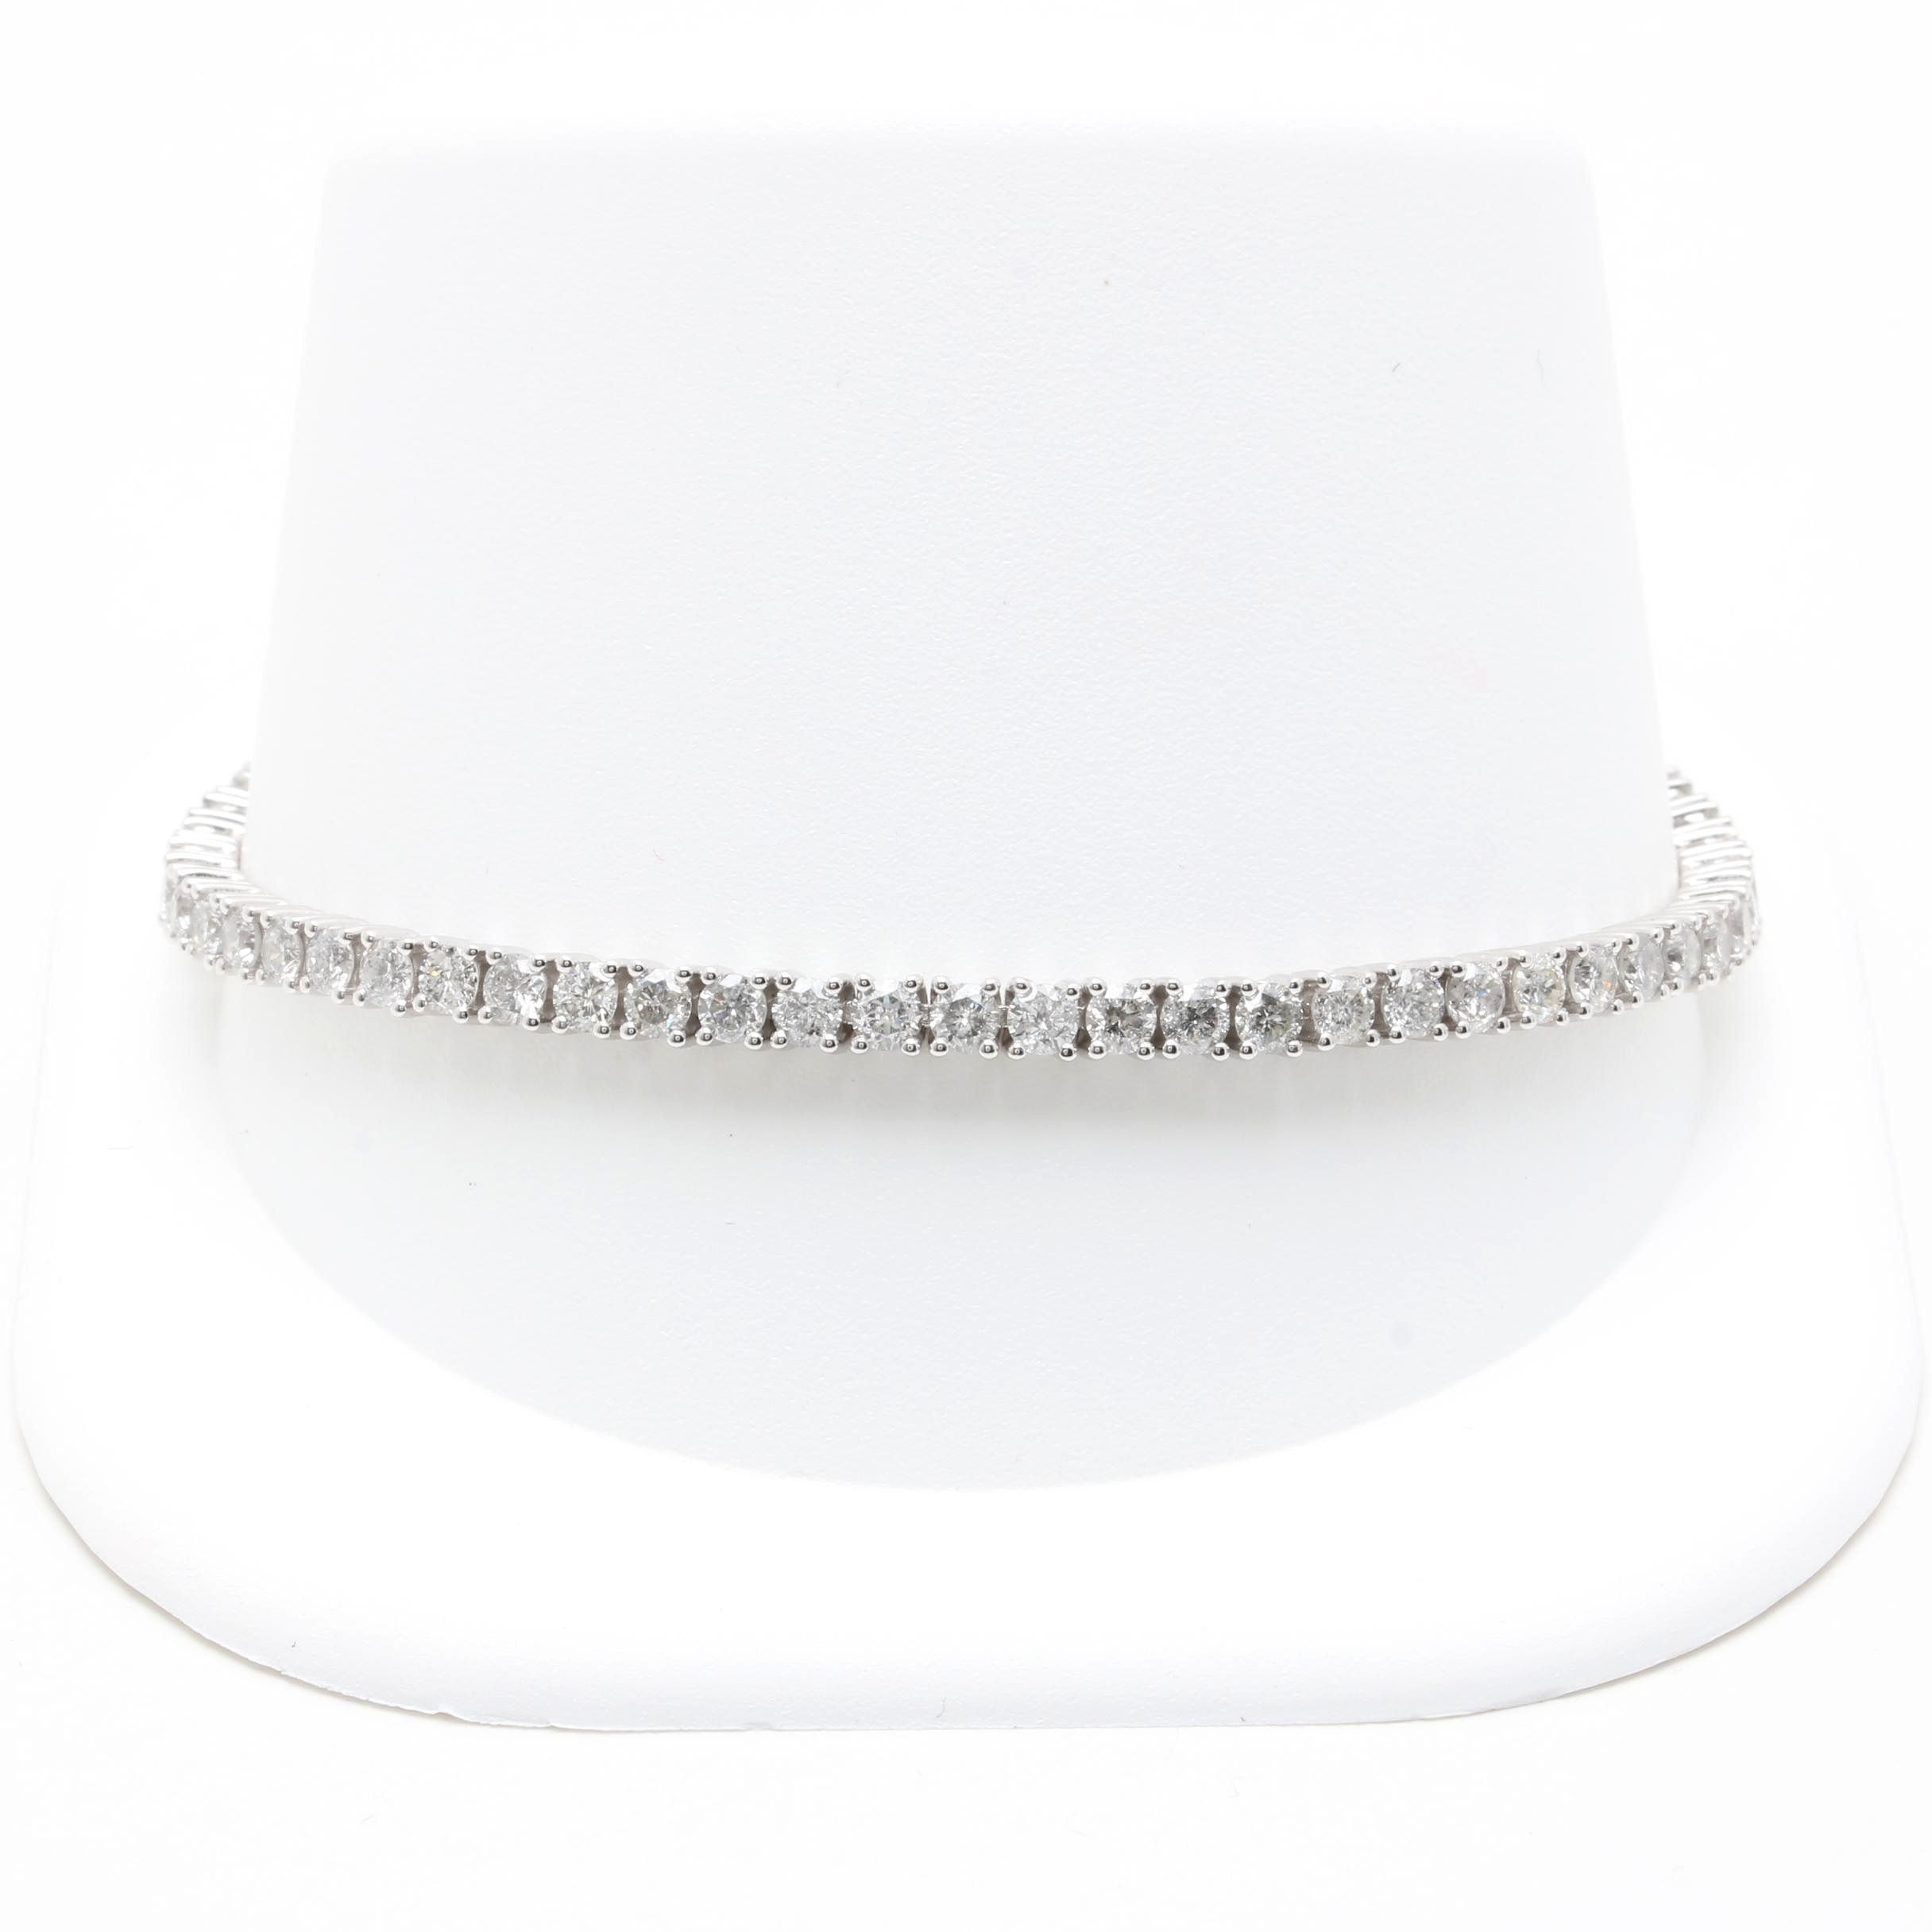 14K White Gold 4.96 CTW Diamond Tennis Bracelet